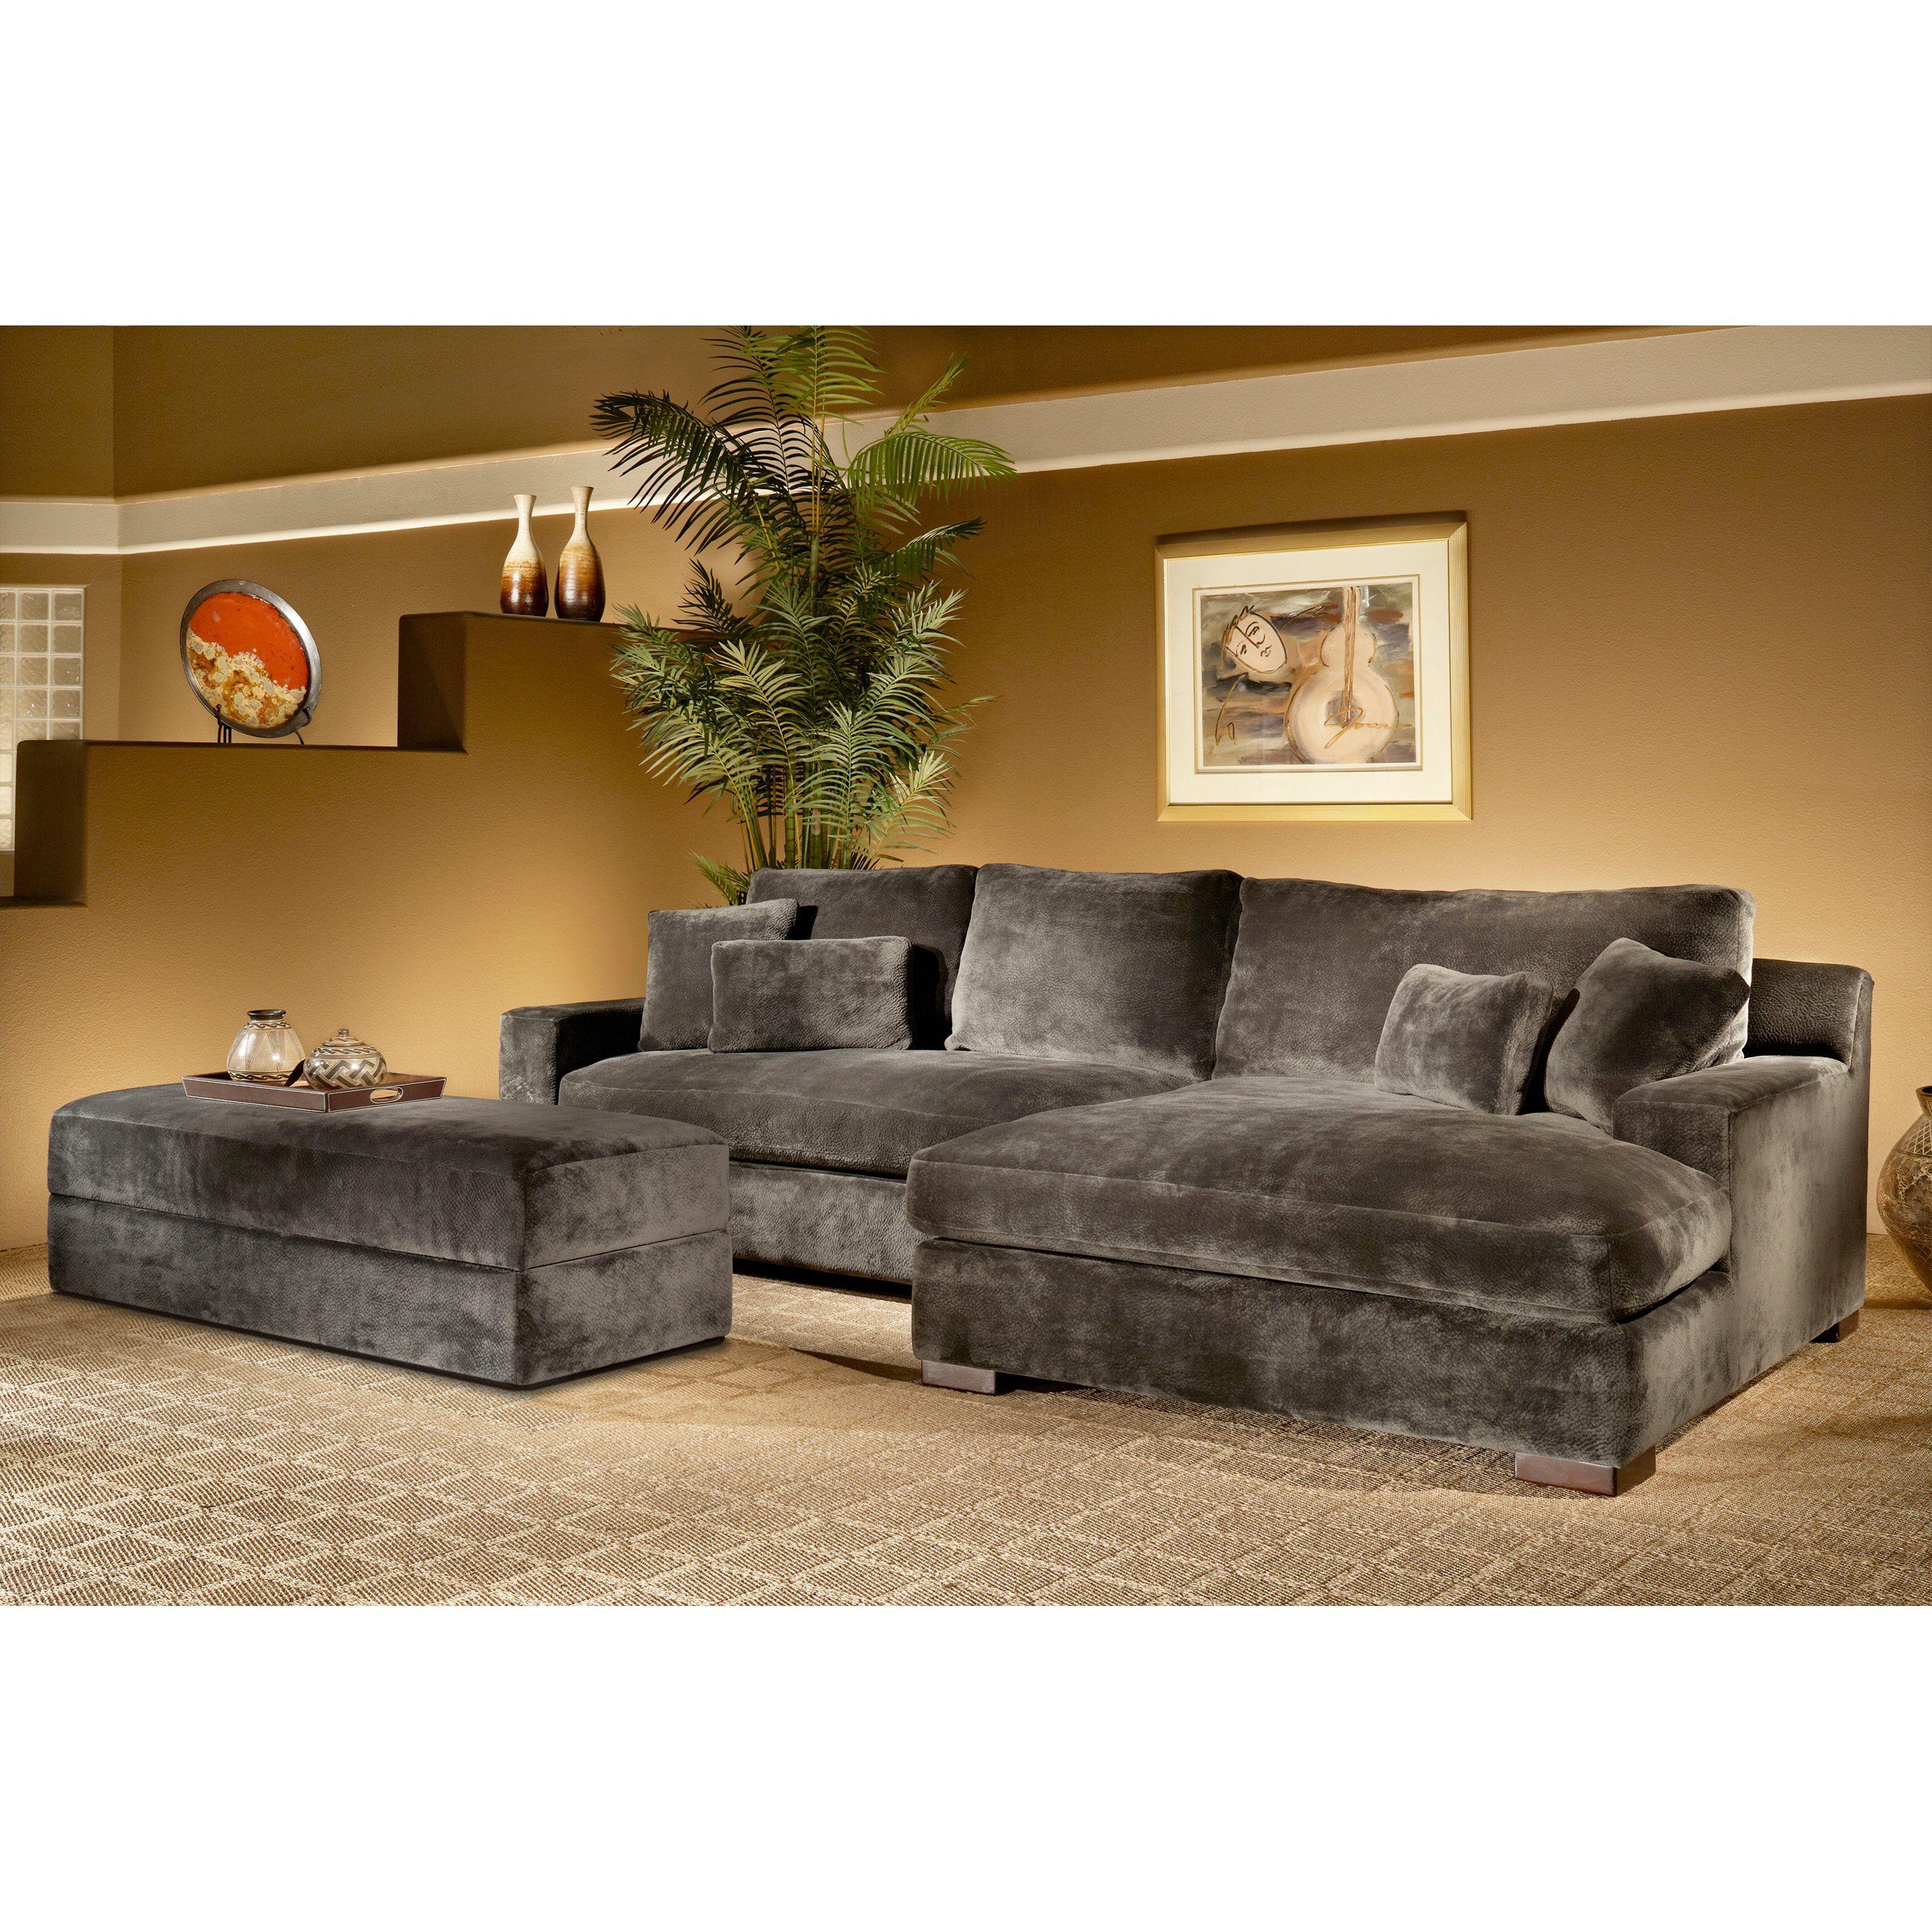 Fairmont Designs Doris 2 Piece Sectional Sofa With Storage